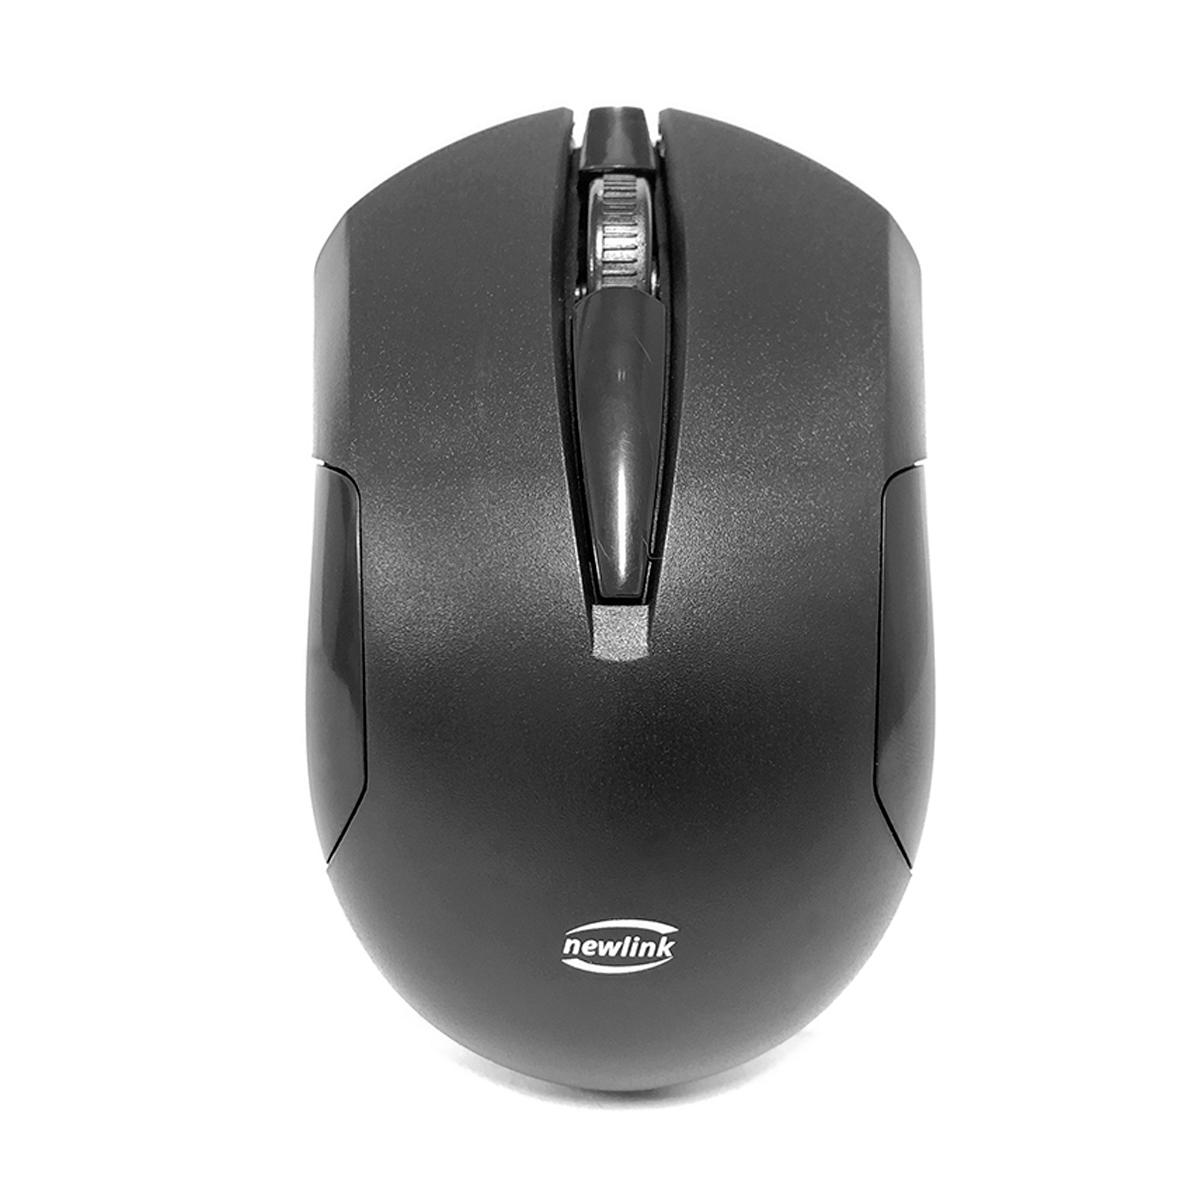 Kit Teclado e Mouse Wireless Newlink Advanced CK102, USB, ABNT2